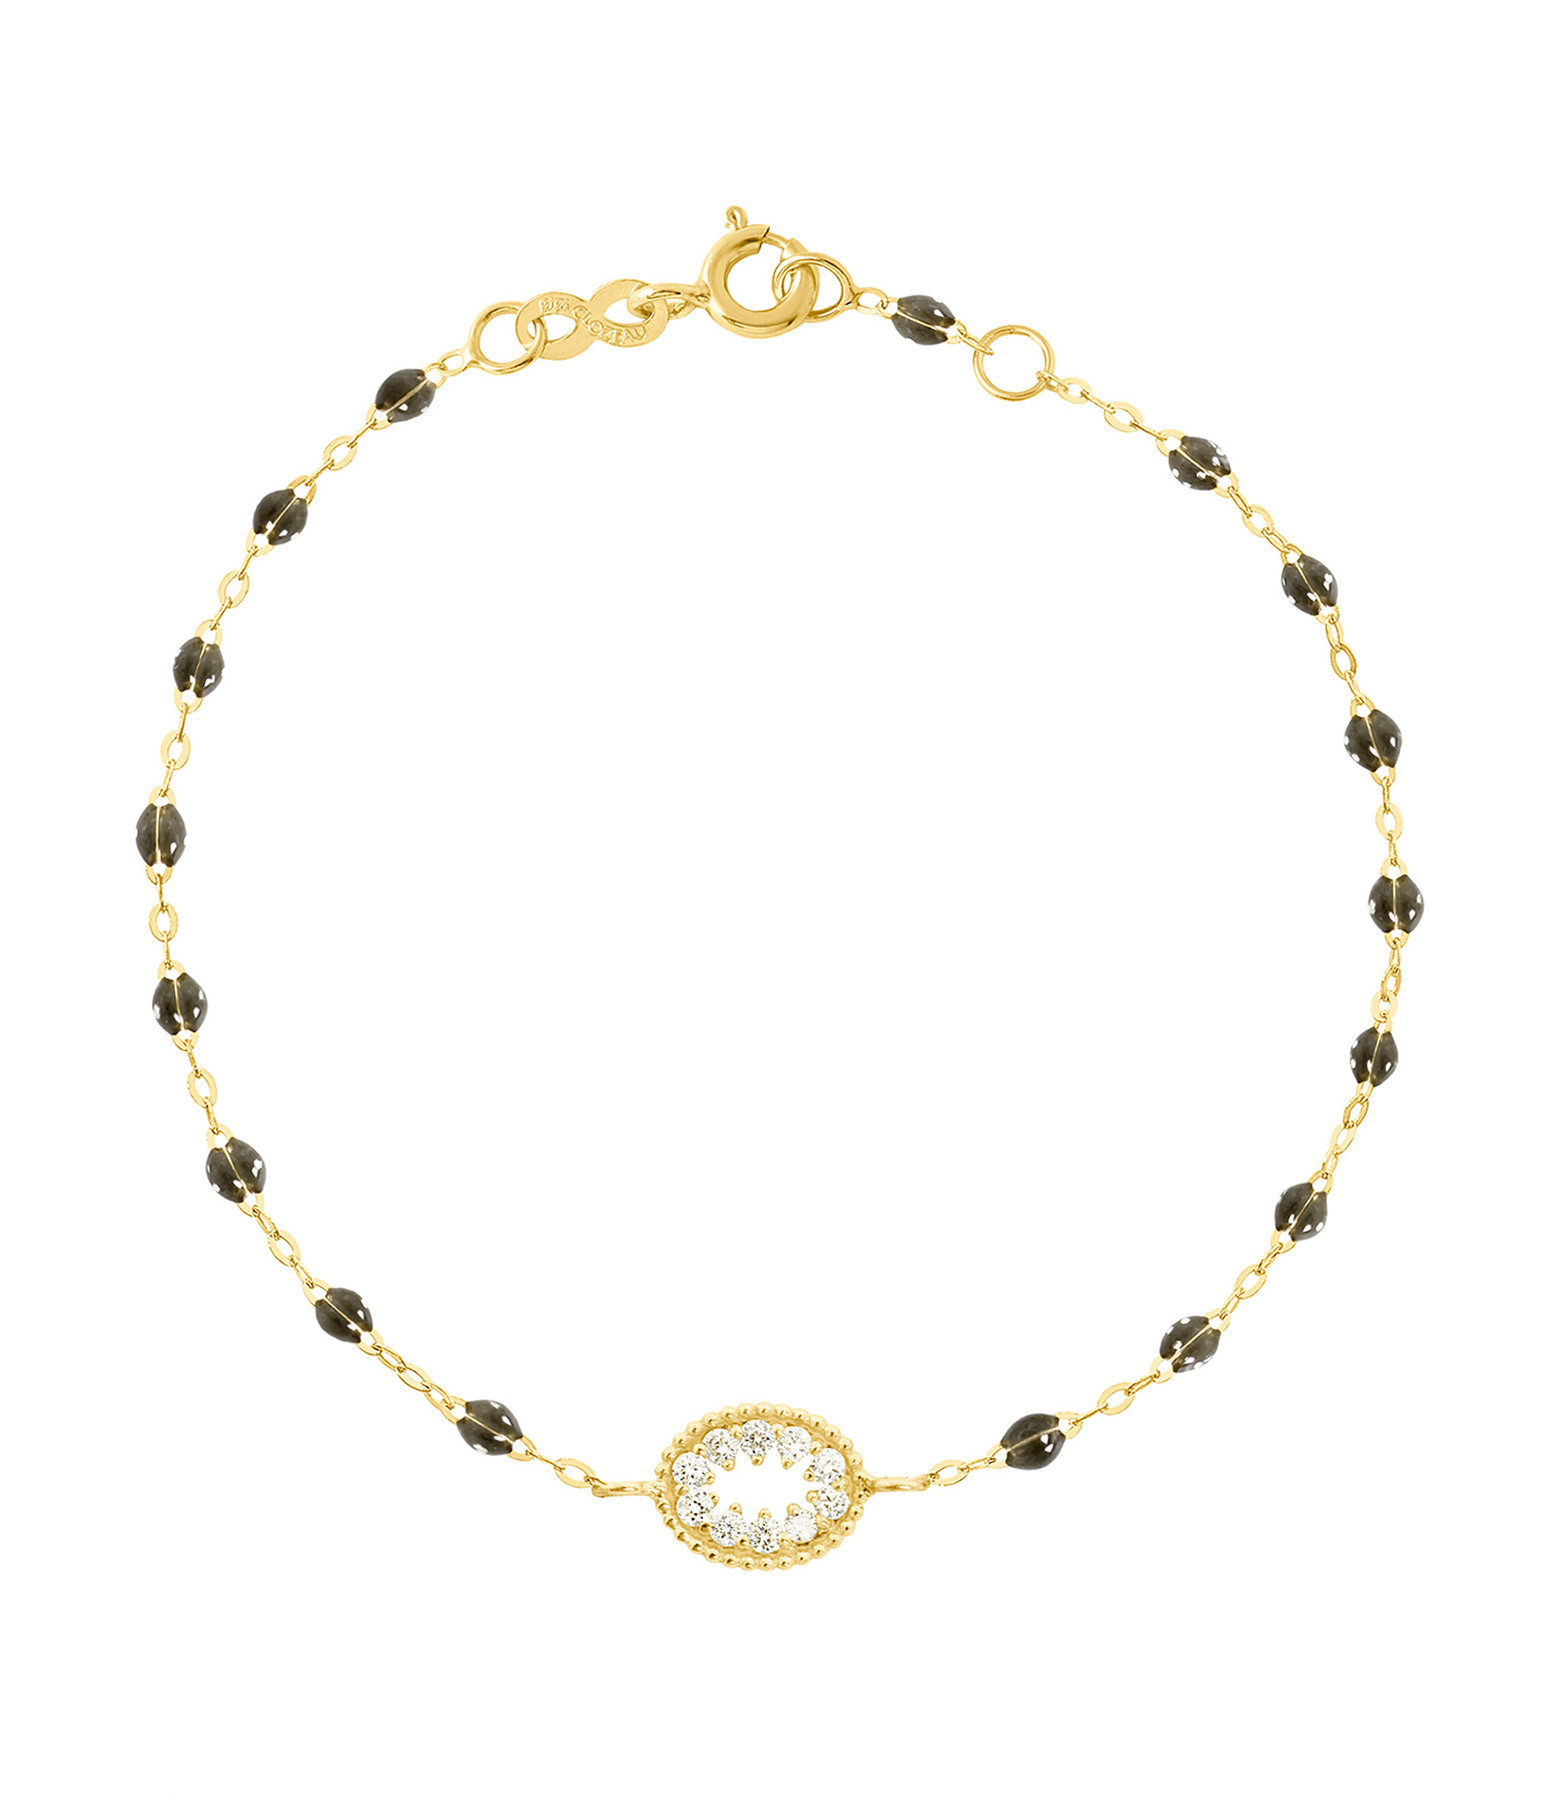 GIGI CLOZEAU - Bracelet Résine L'Œil du Pirate Diams Or jaune